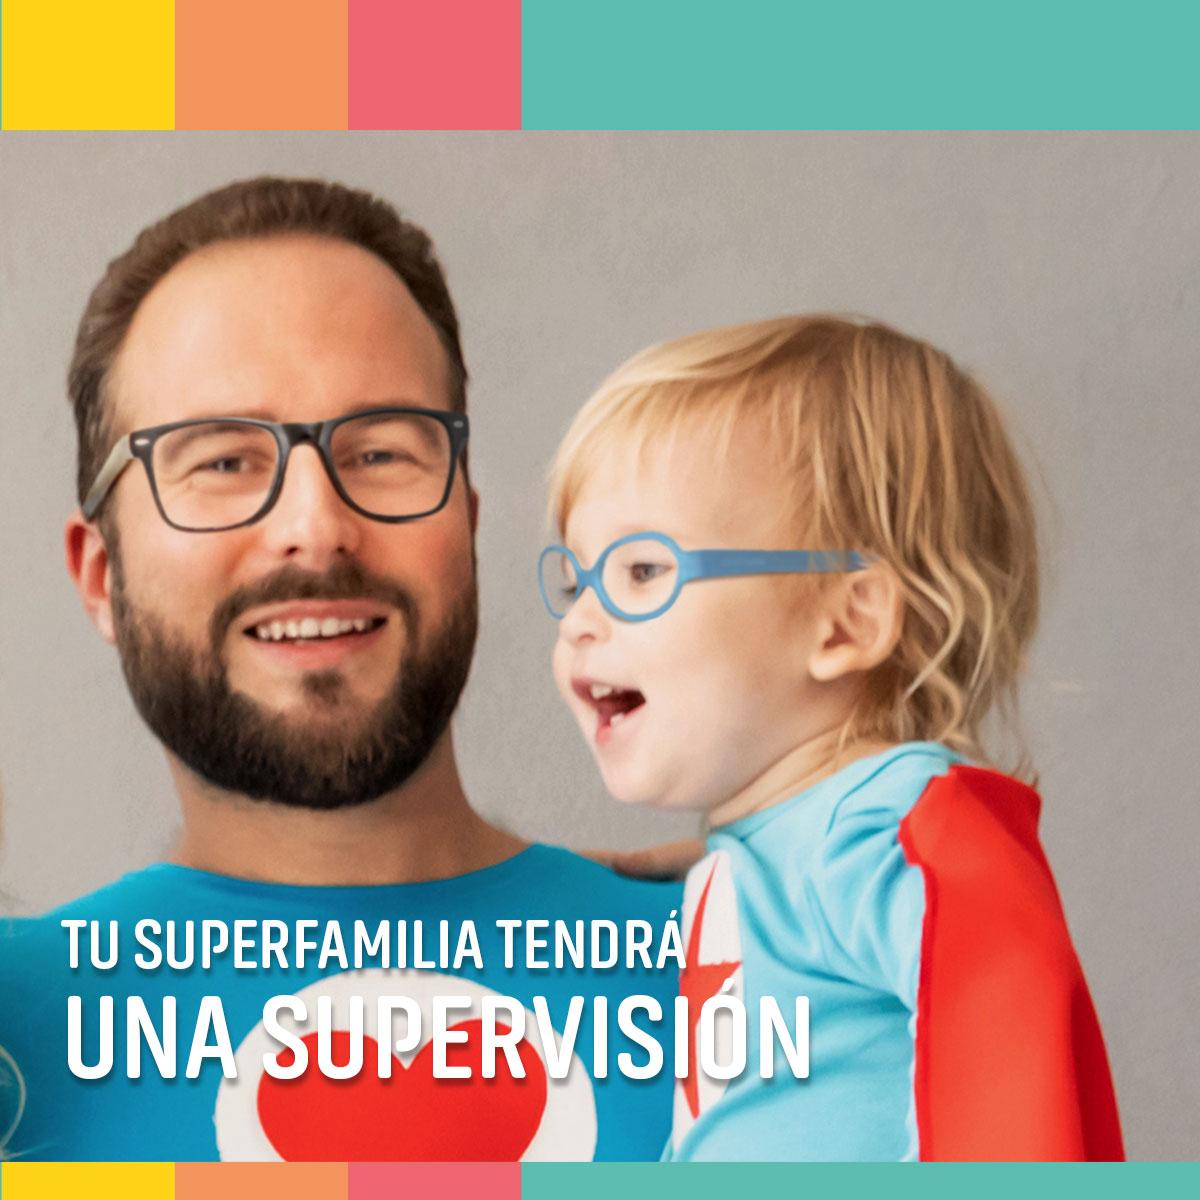 Plan Super Familias03 - PLAN SUPERFAMILIA -45% Y GRATIS